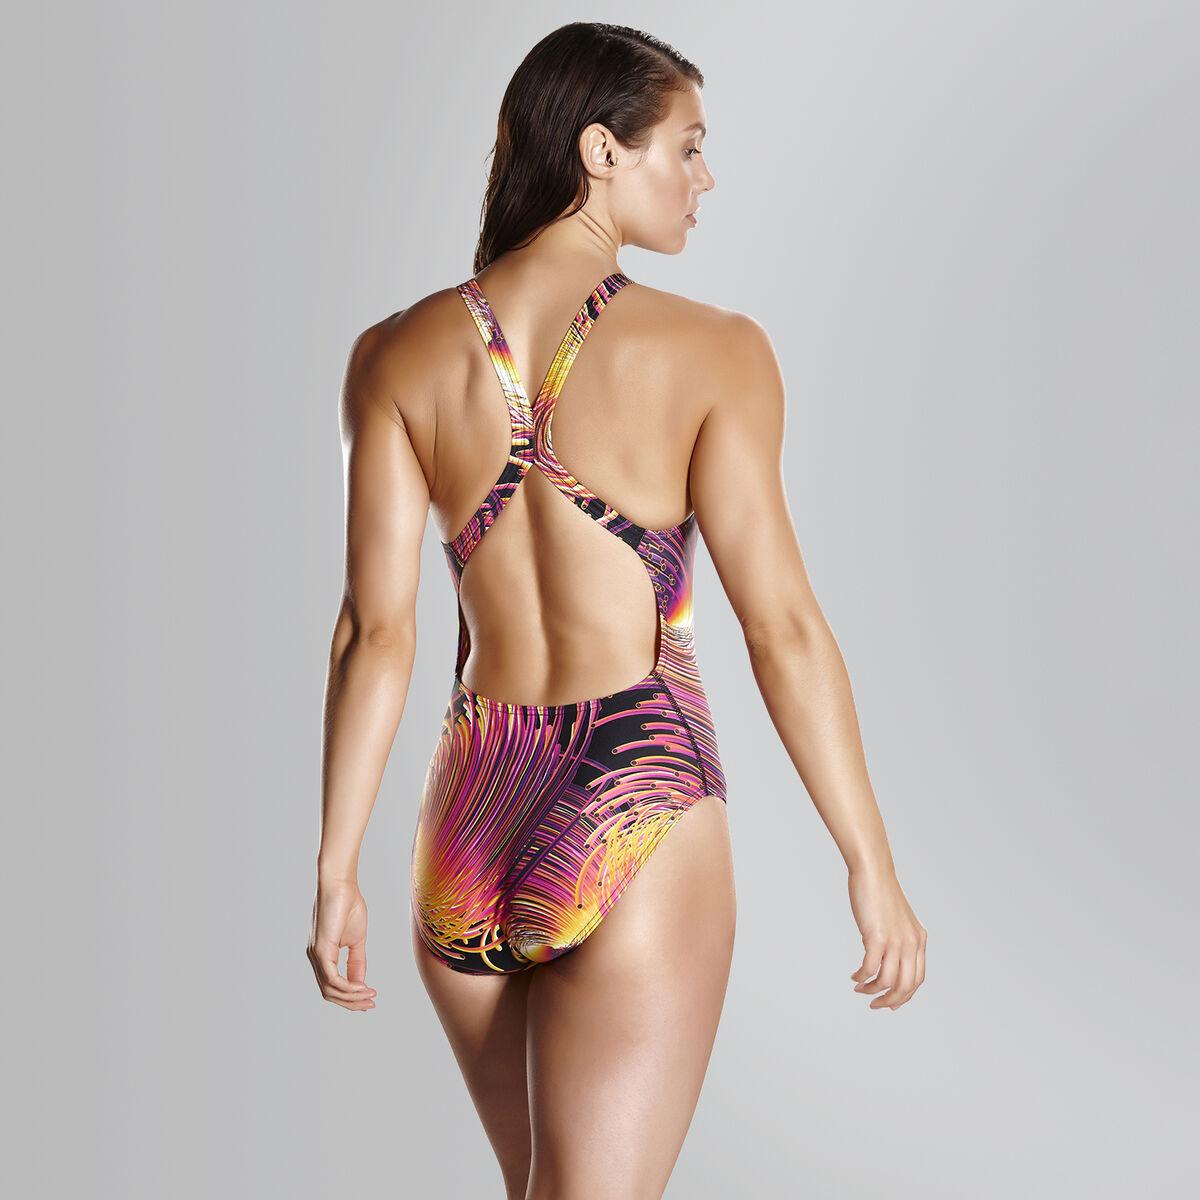 Astrostar Powerback Swimsuit